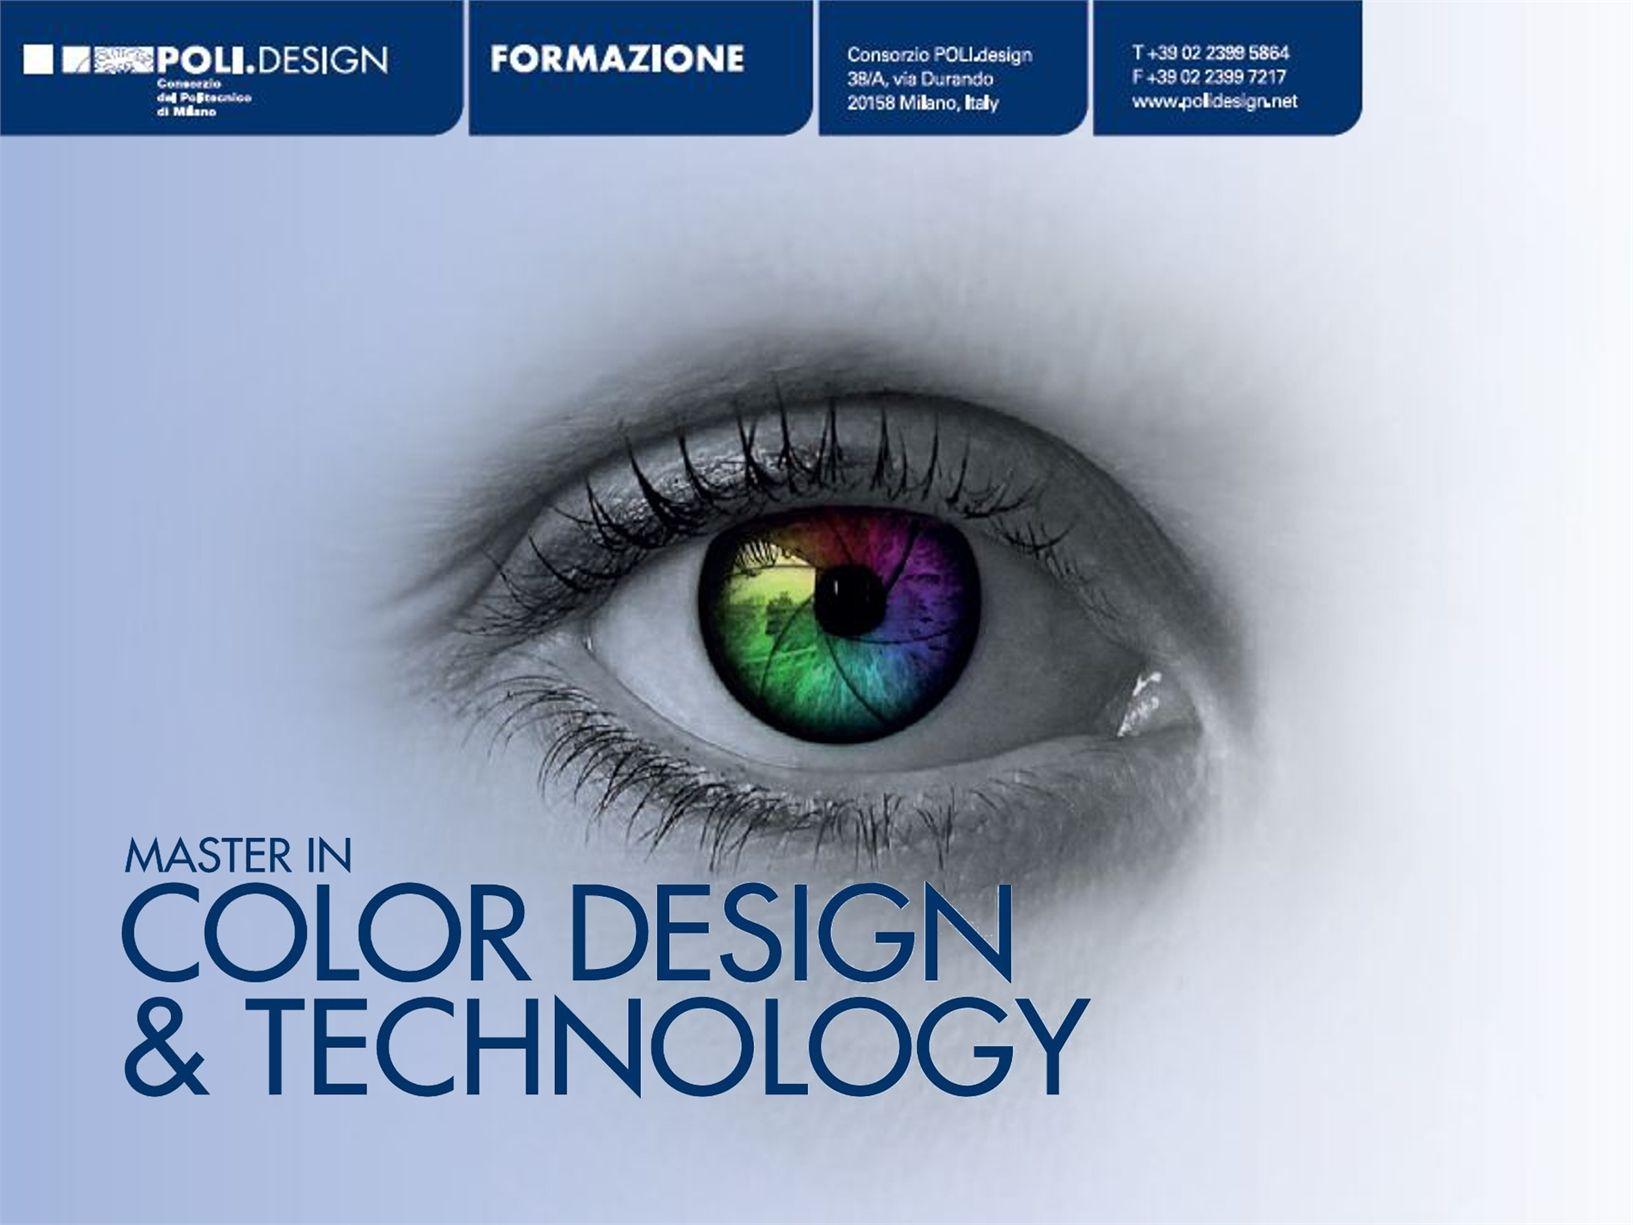 Poli.design - Master in Color & Technology